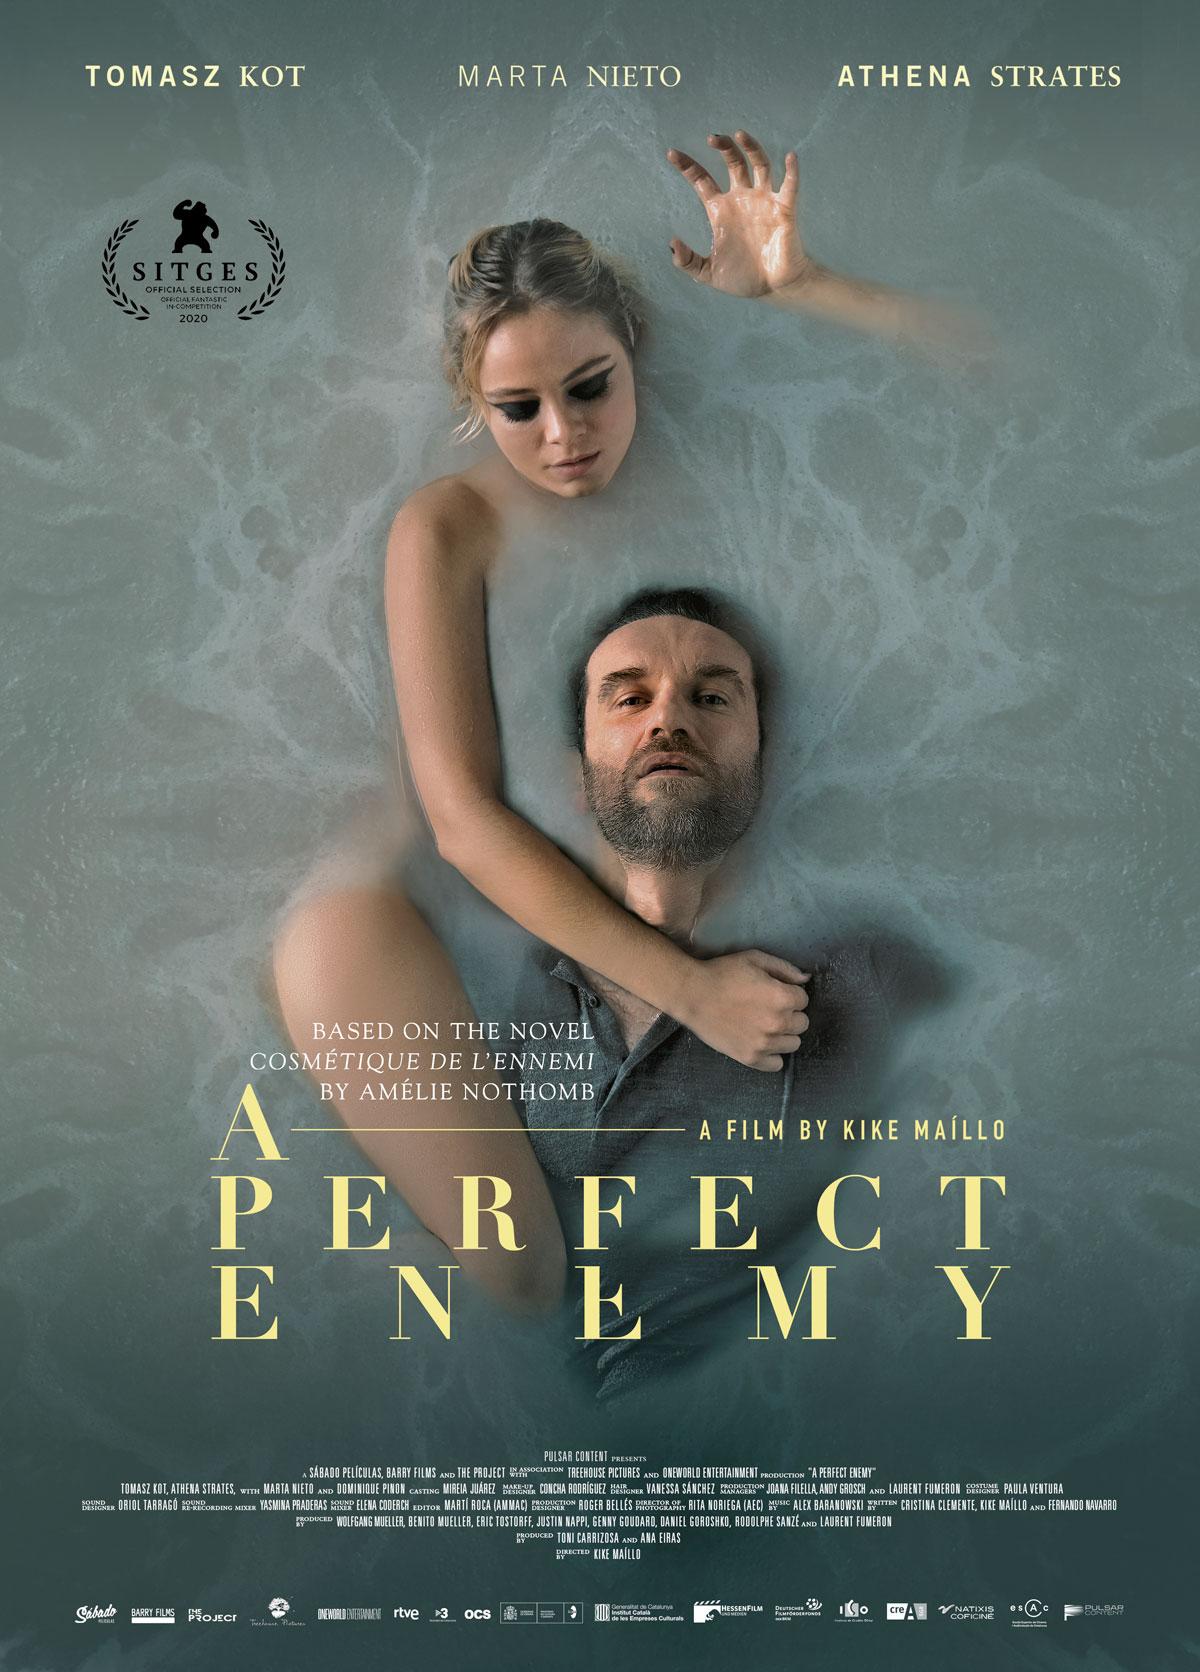 [好雷] 完美敵人 A Perfect Enemy (2020 西班牙)